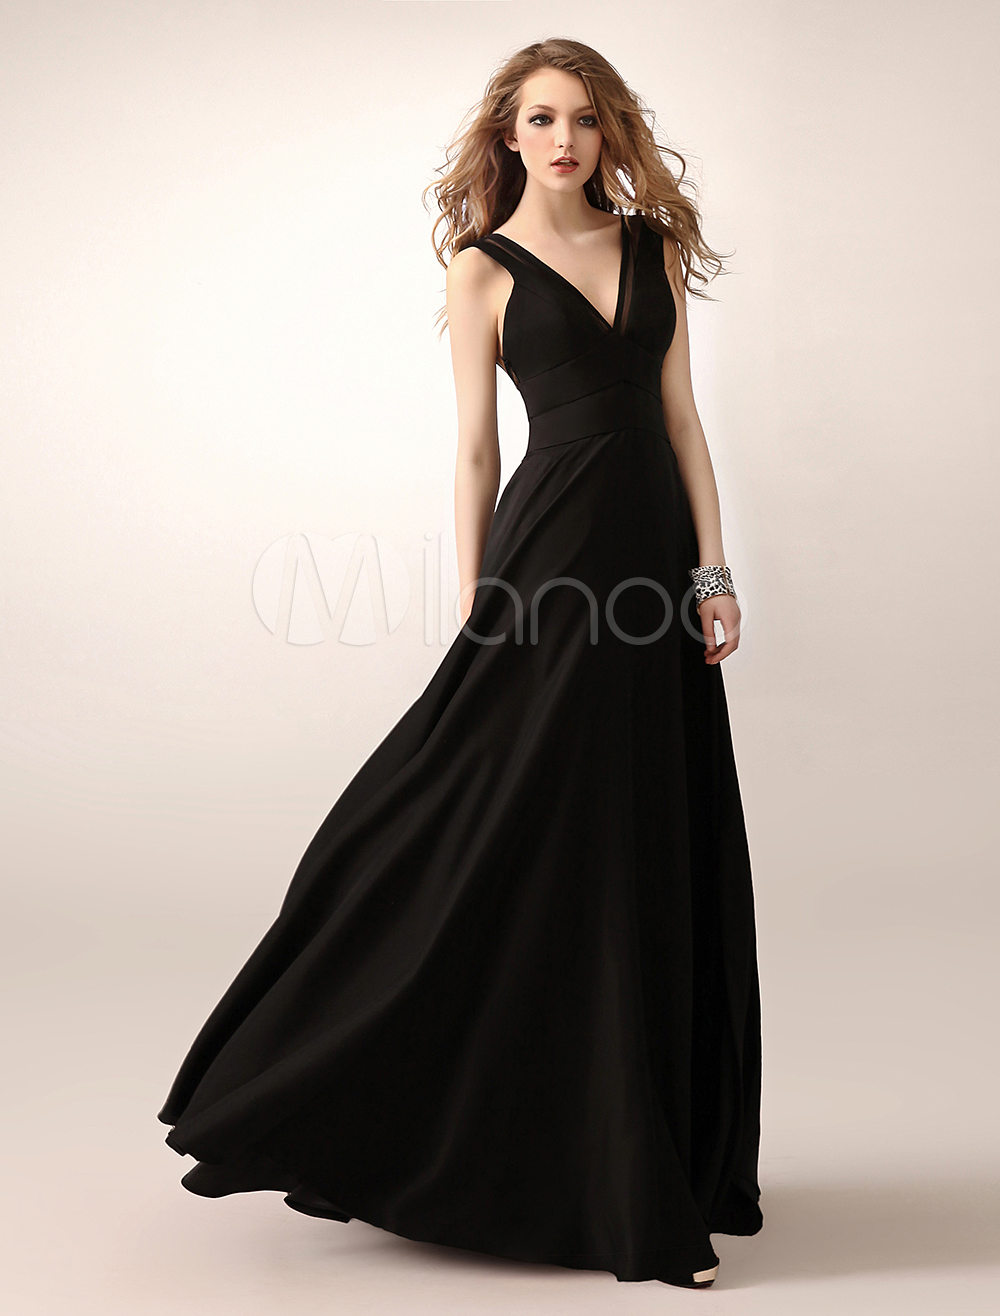 Black Evening Dress Cut Out Mesh Satin Prom Dress (Wedding Evening Dresses) photo